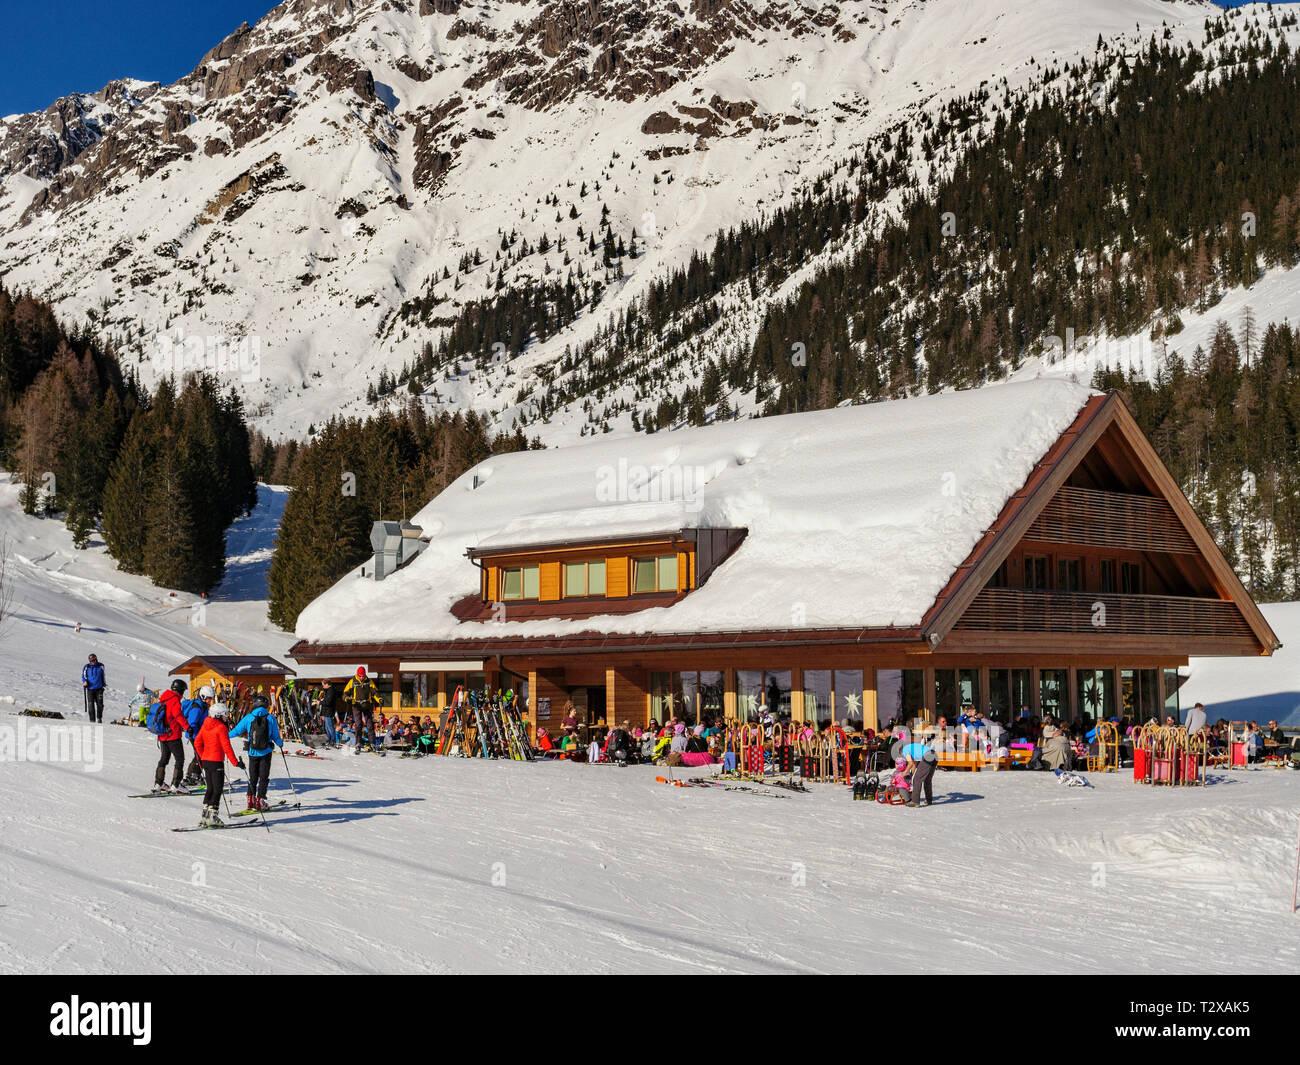 winter sports, alp  Untermarkter Alm, skiing area Hochimst, Imst, Tyrol, Austria, Europe - Stock Image